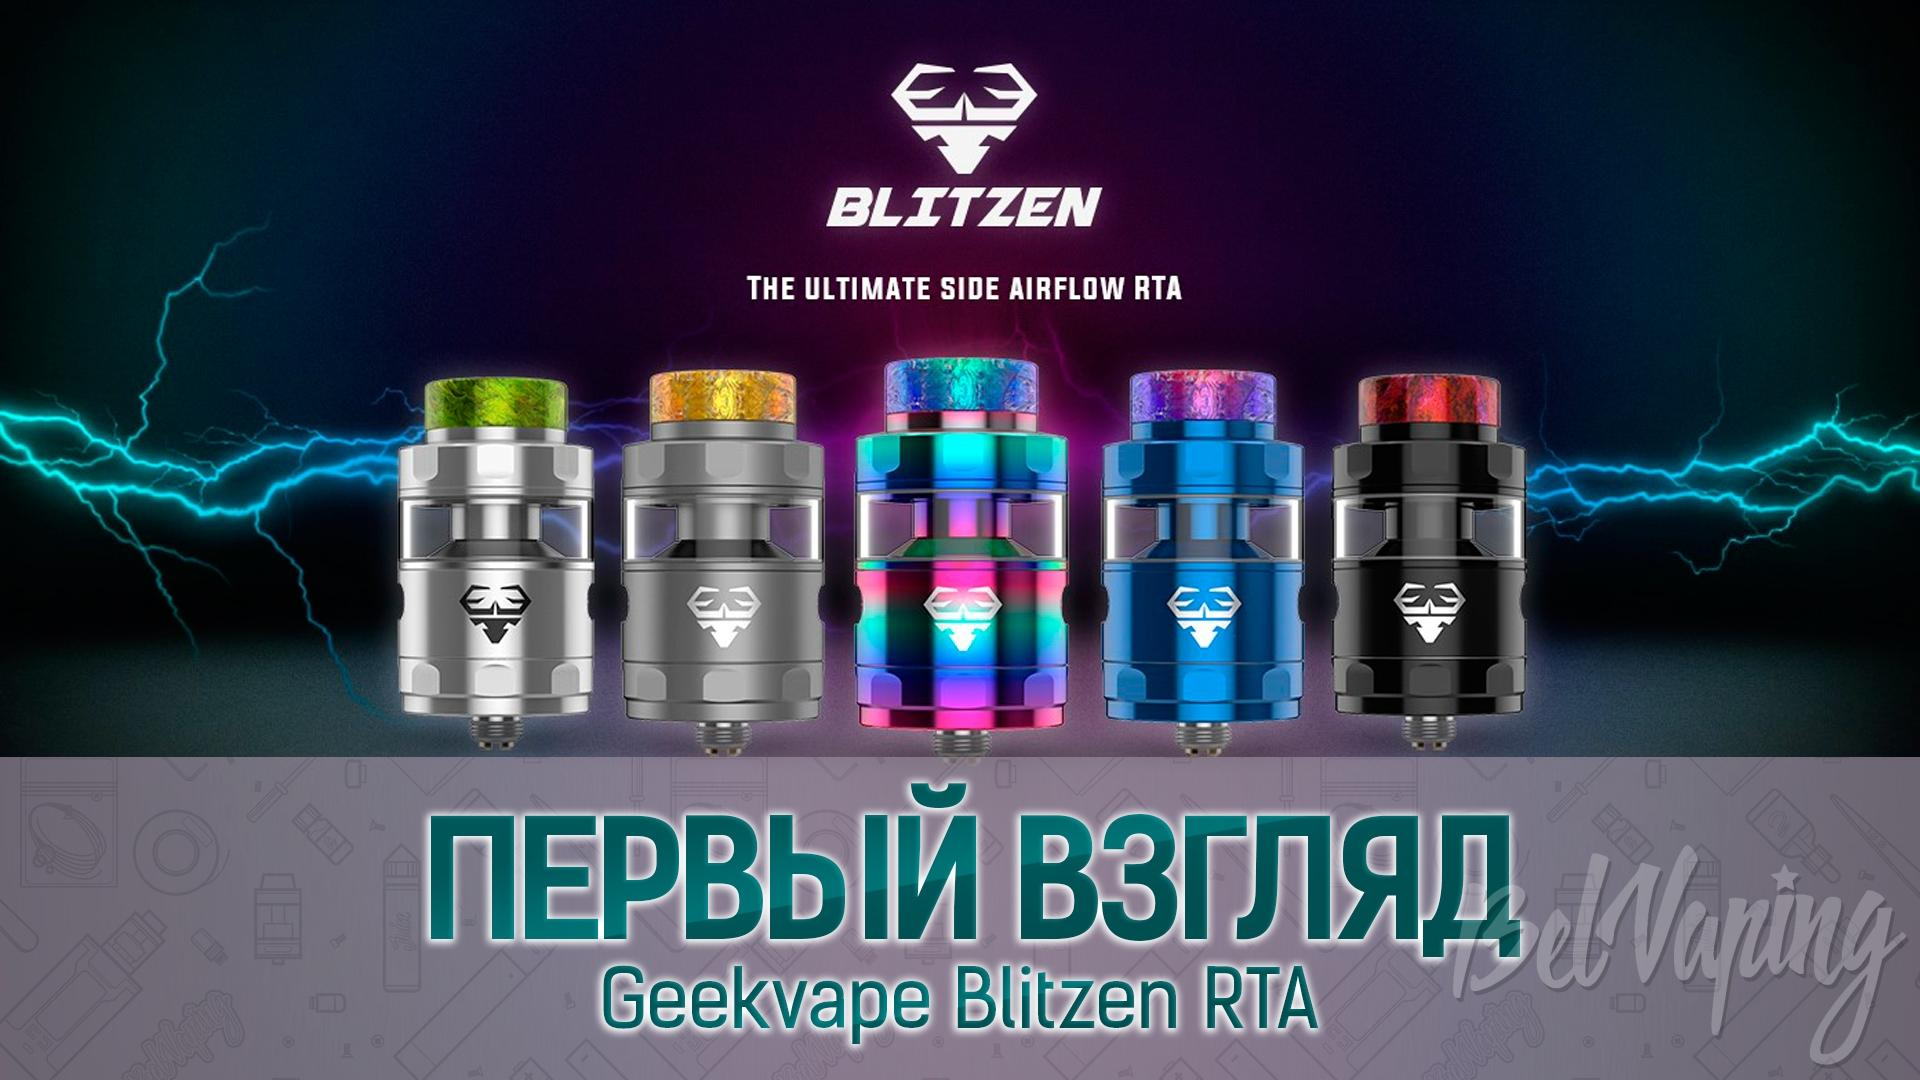 Geekvape Blitzen RTA. Первый взгляд